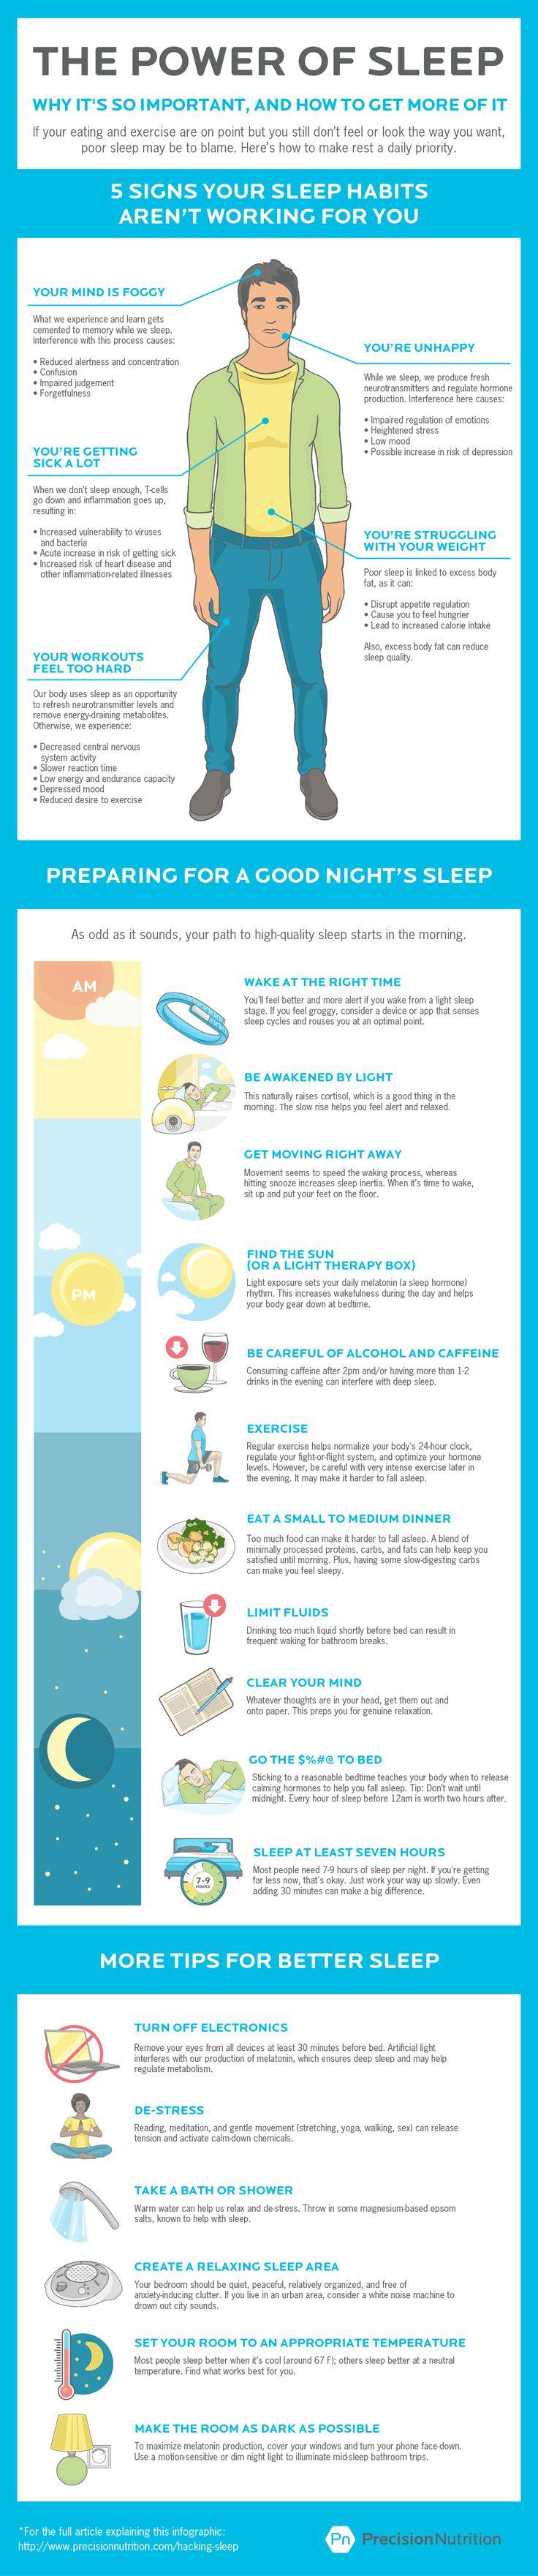 The Power of Sleep - Precision Nutrition